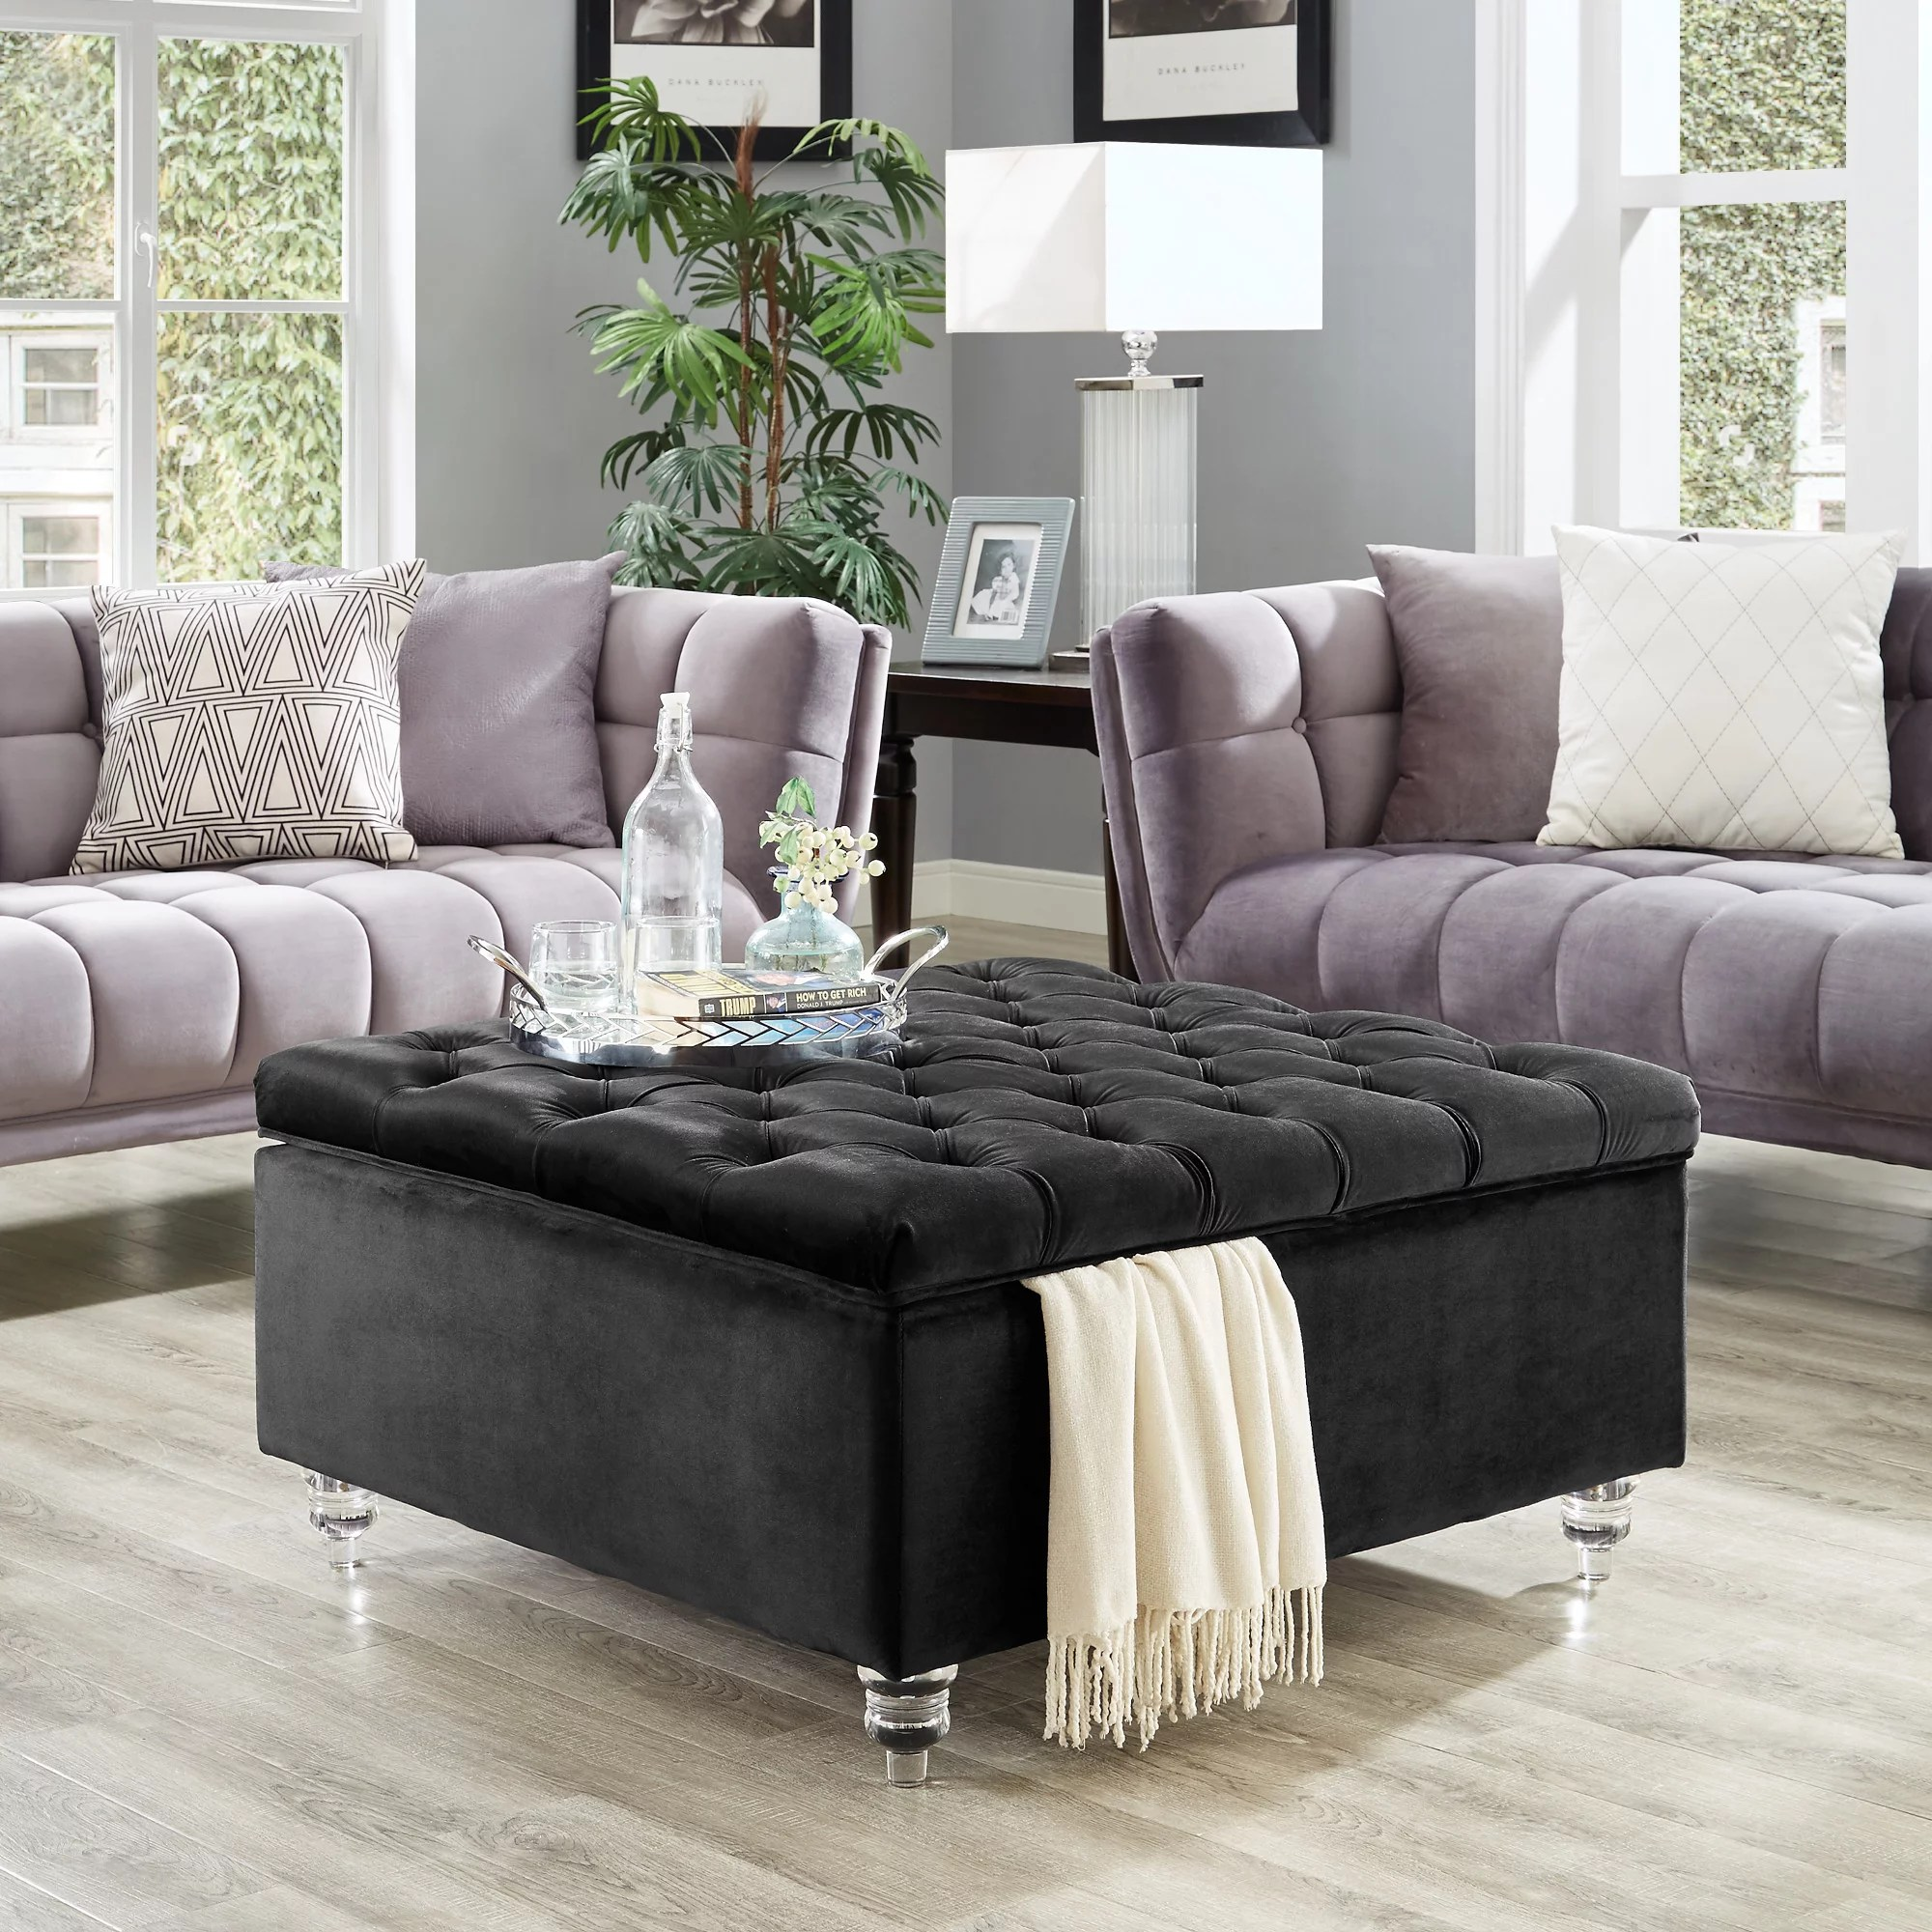 inspired home clarissa velvet storage ottoman cocktail coffee table square tufted black walmart com